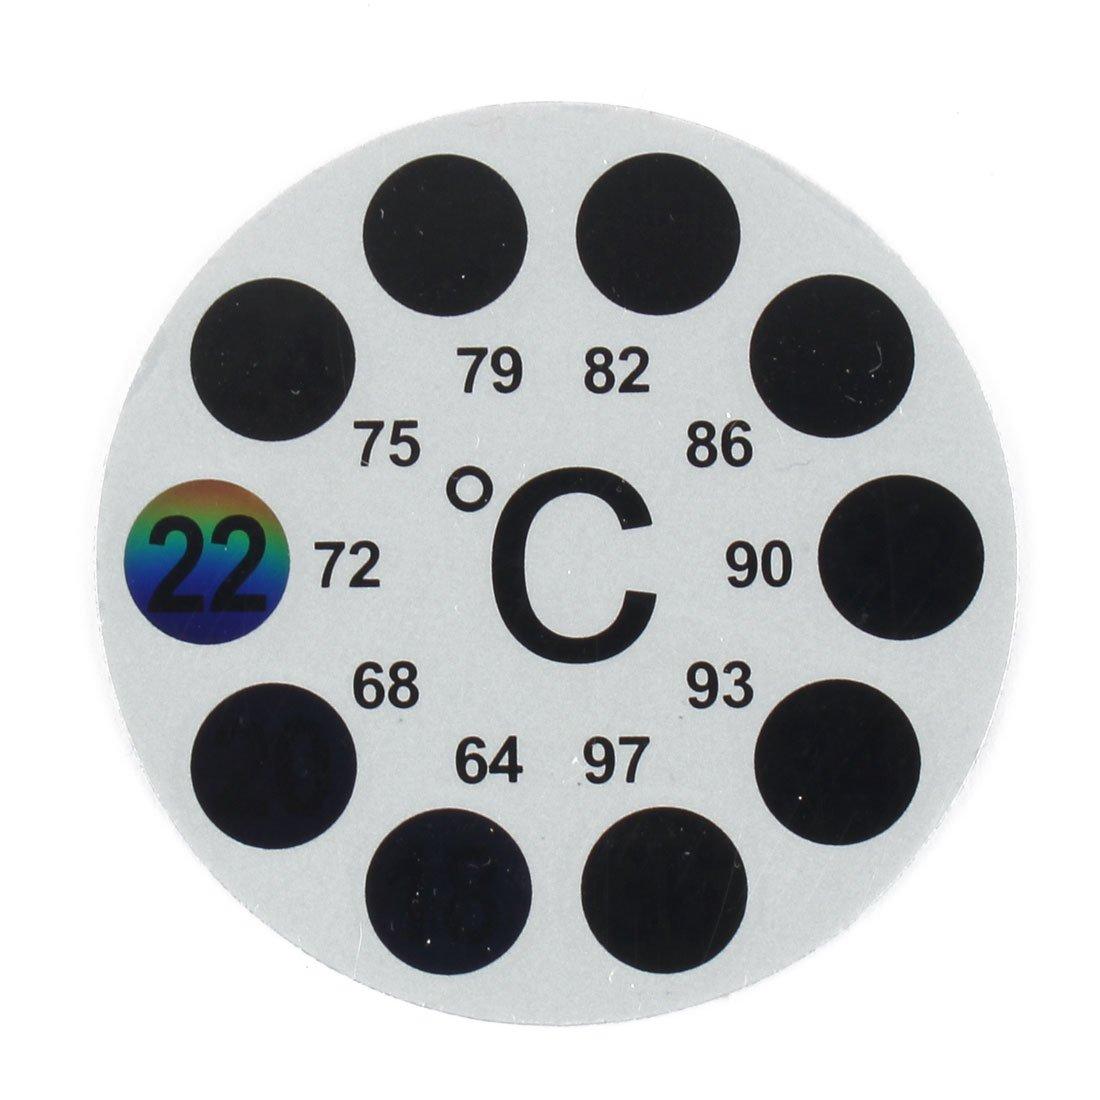 uxcell Plastic Aquarium Round Shaped Sticker Thermometer Temperature Indicator a16120700ux0056